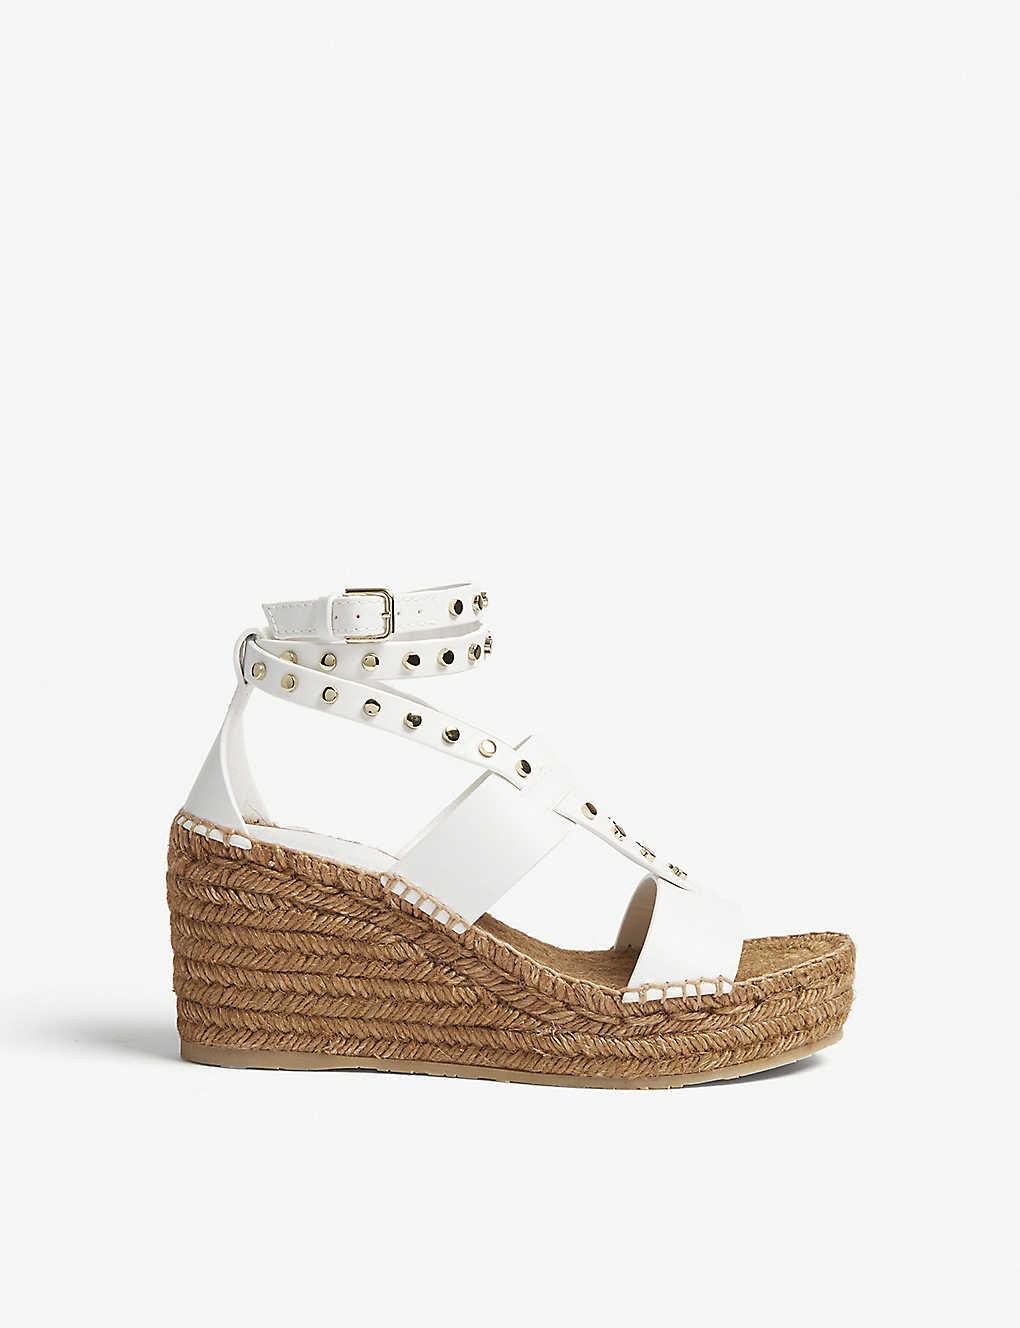 9b072f1c710 JIMMY CHOO - Danica 80 Vachetta leather sandals   Selfridges.com